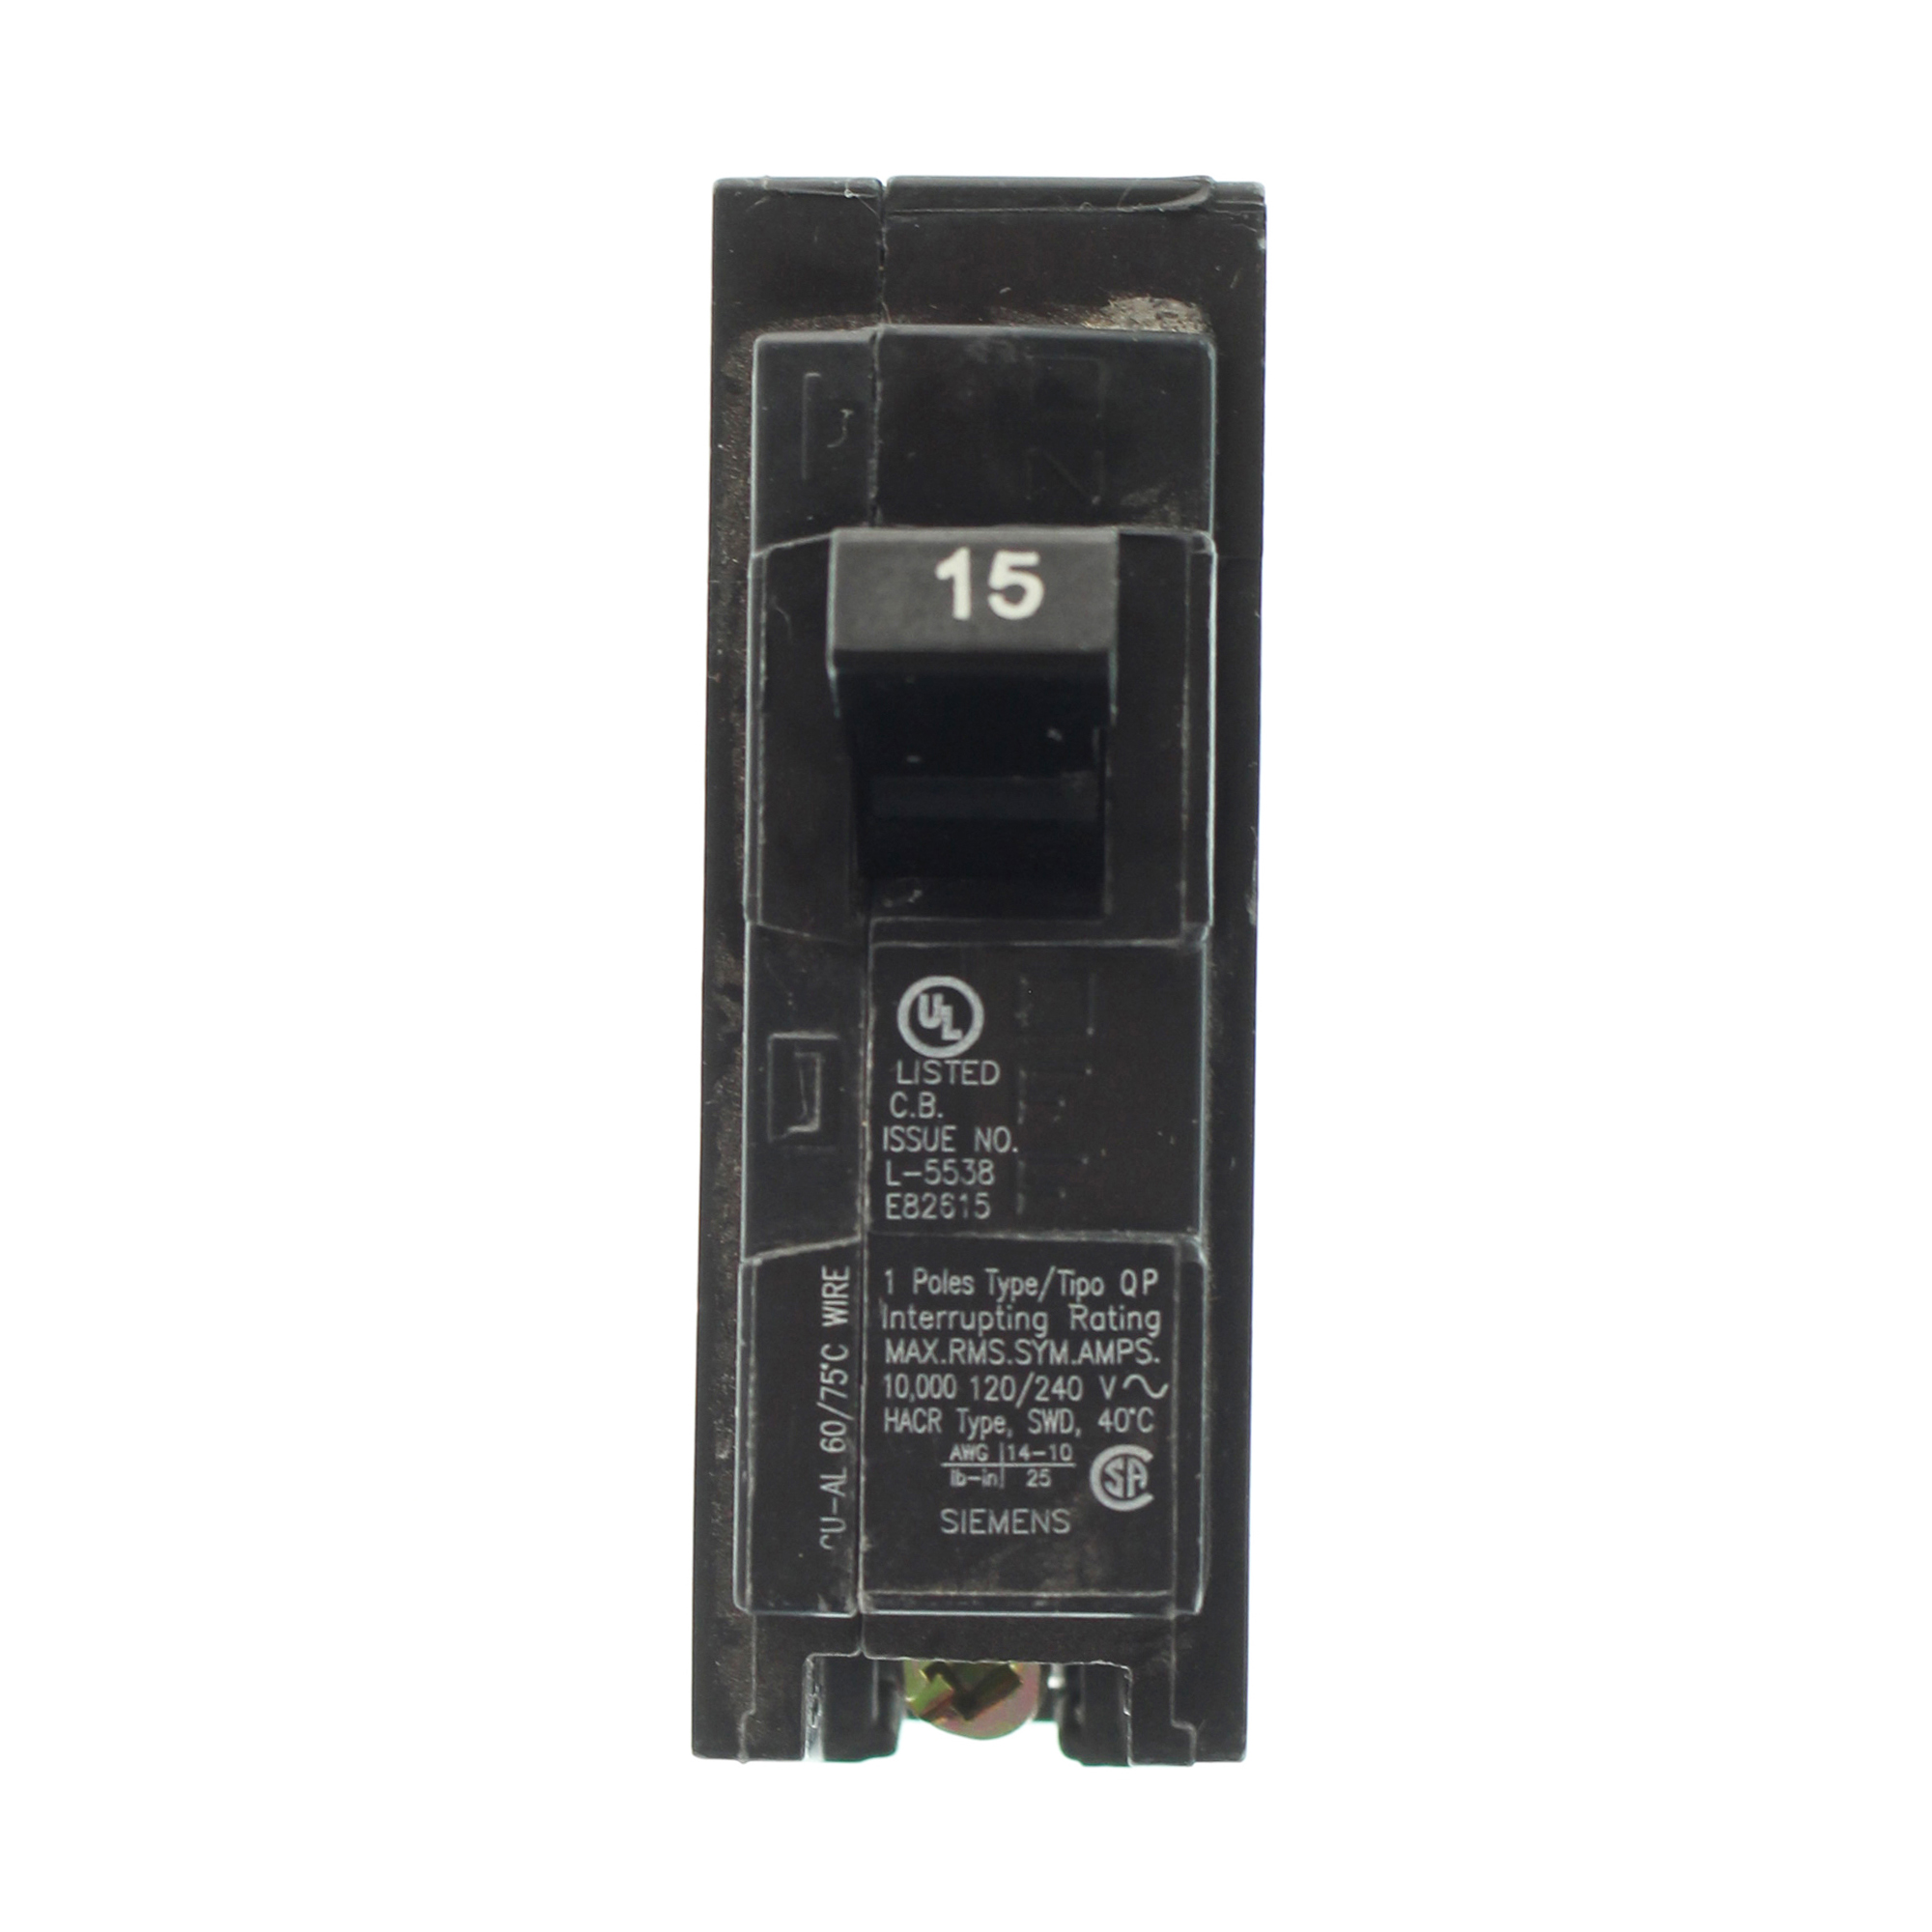 Siemens QP Q115 1 Pole 15 Amp Circuit Breaker | eBay